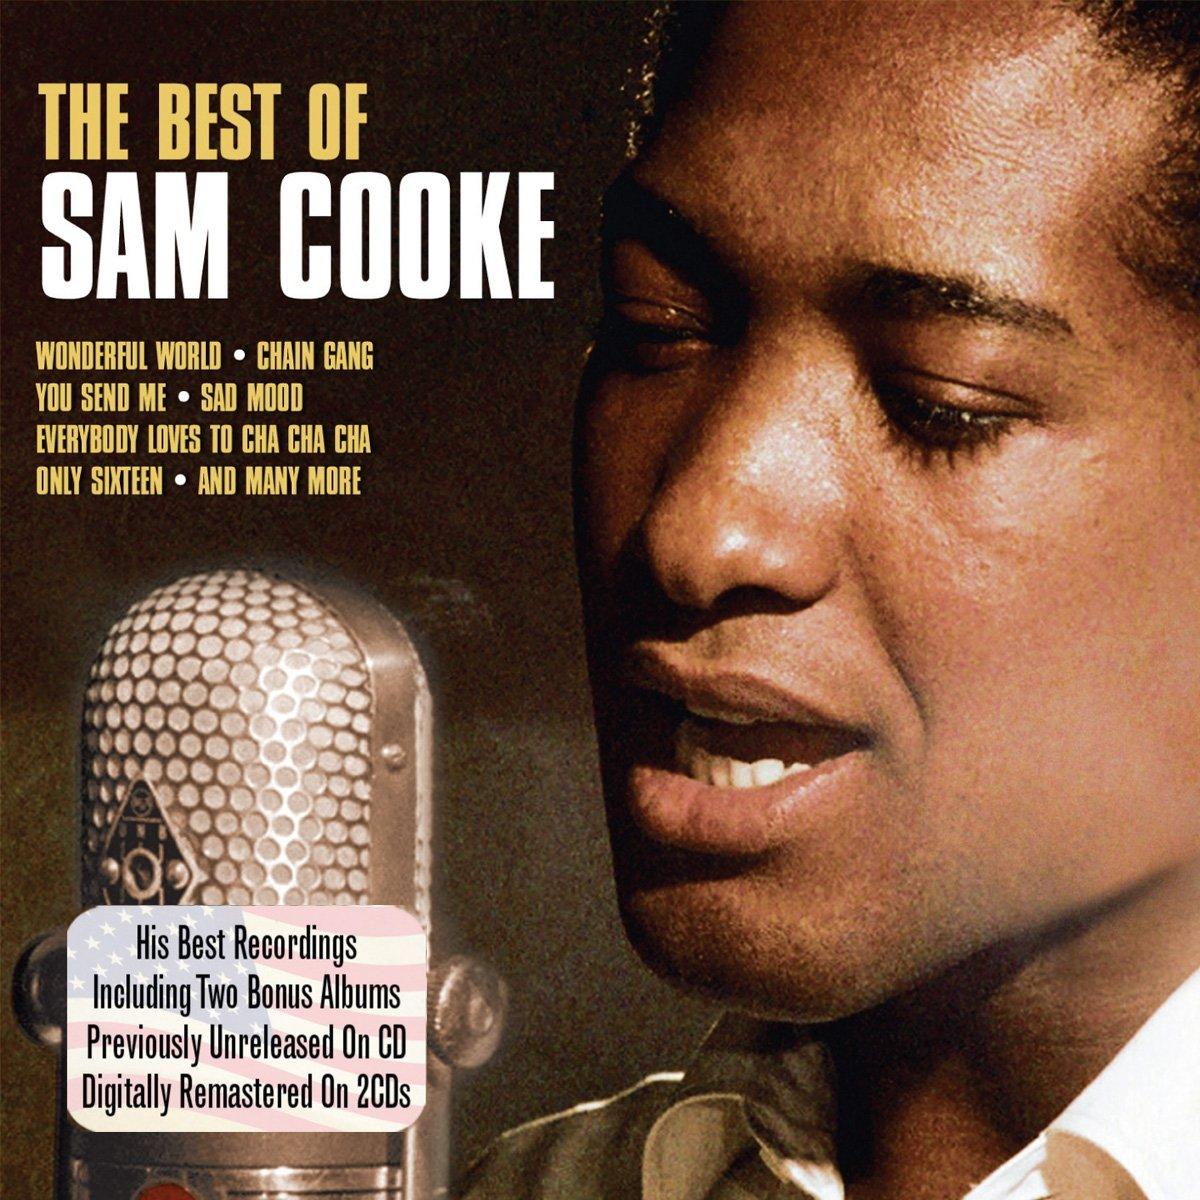 Sam Cooke - The Best Of | CD kopen